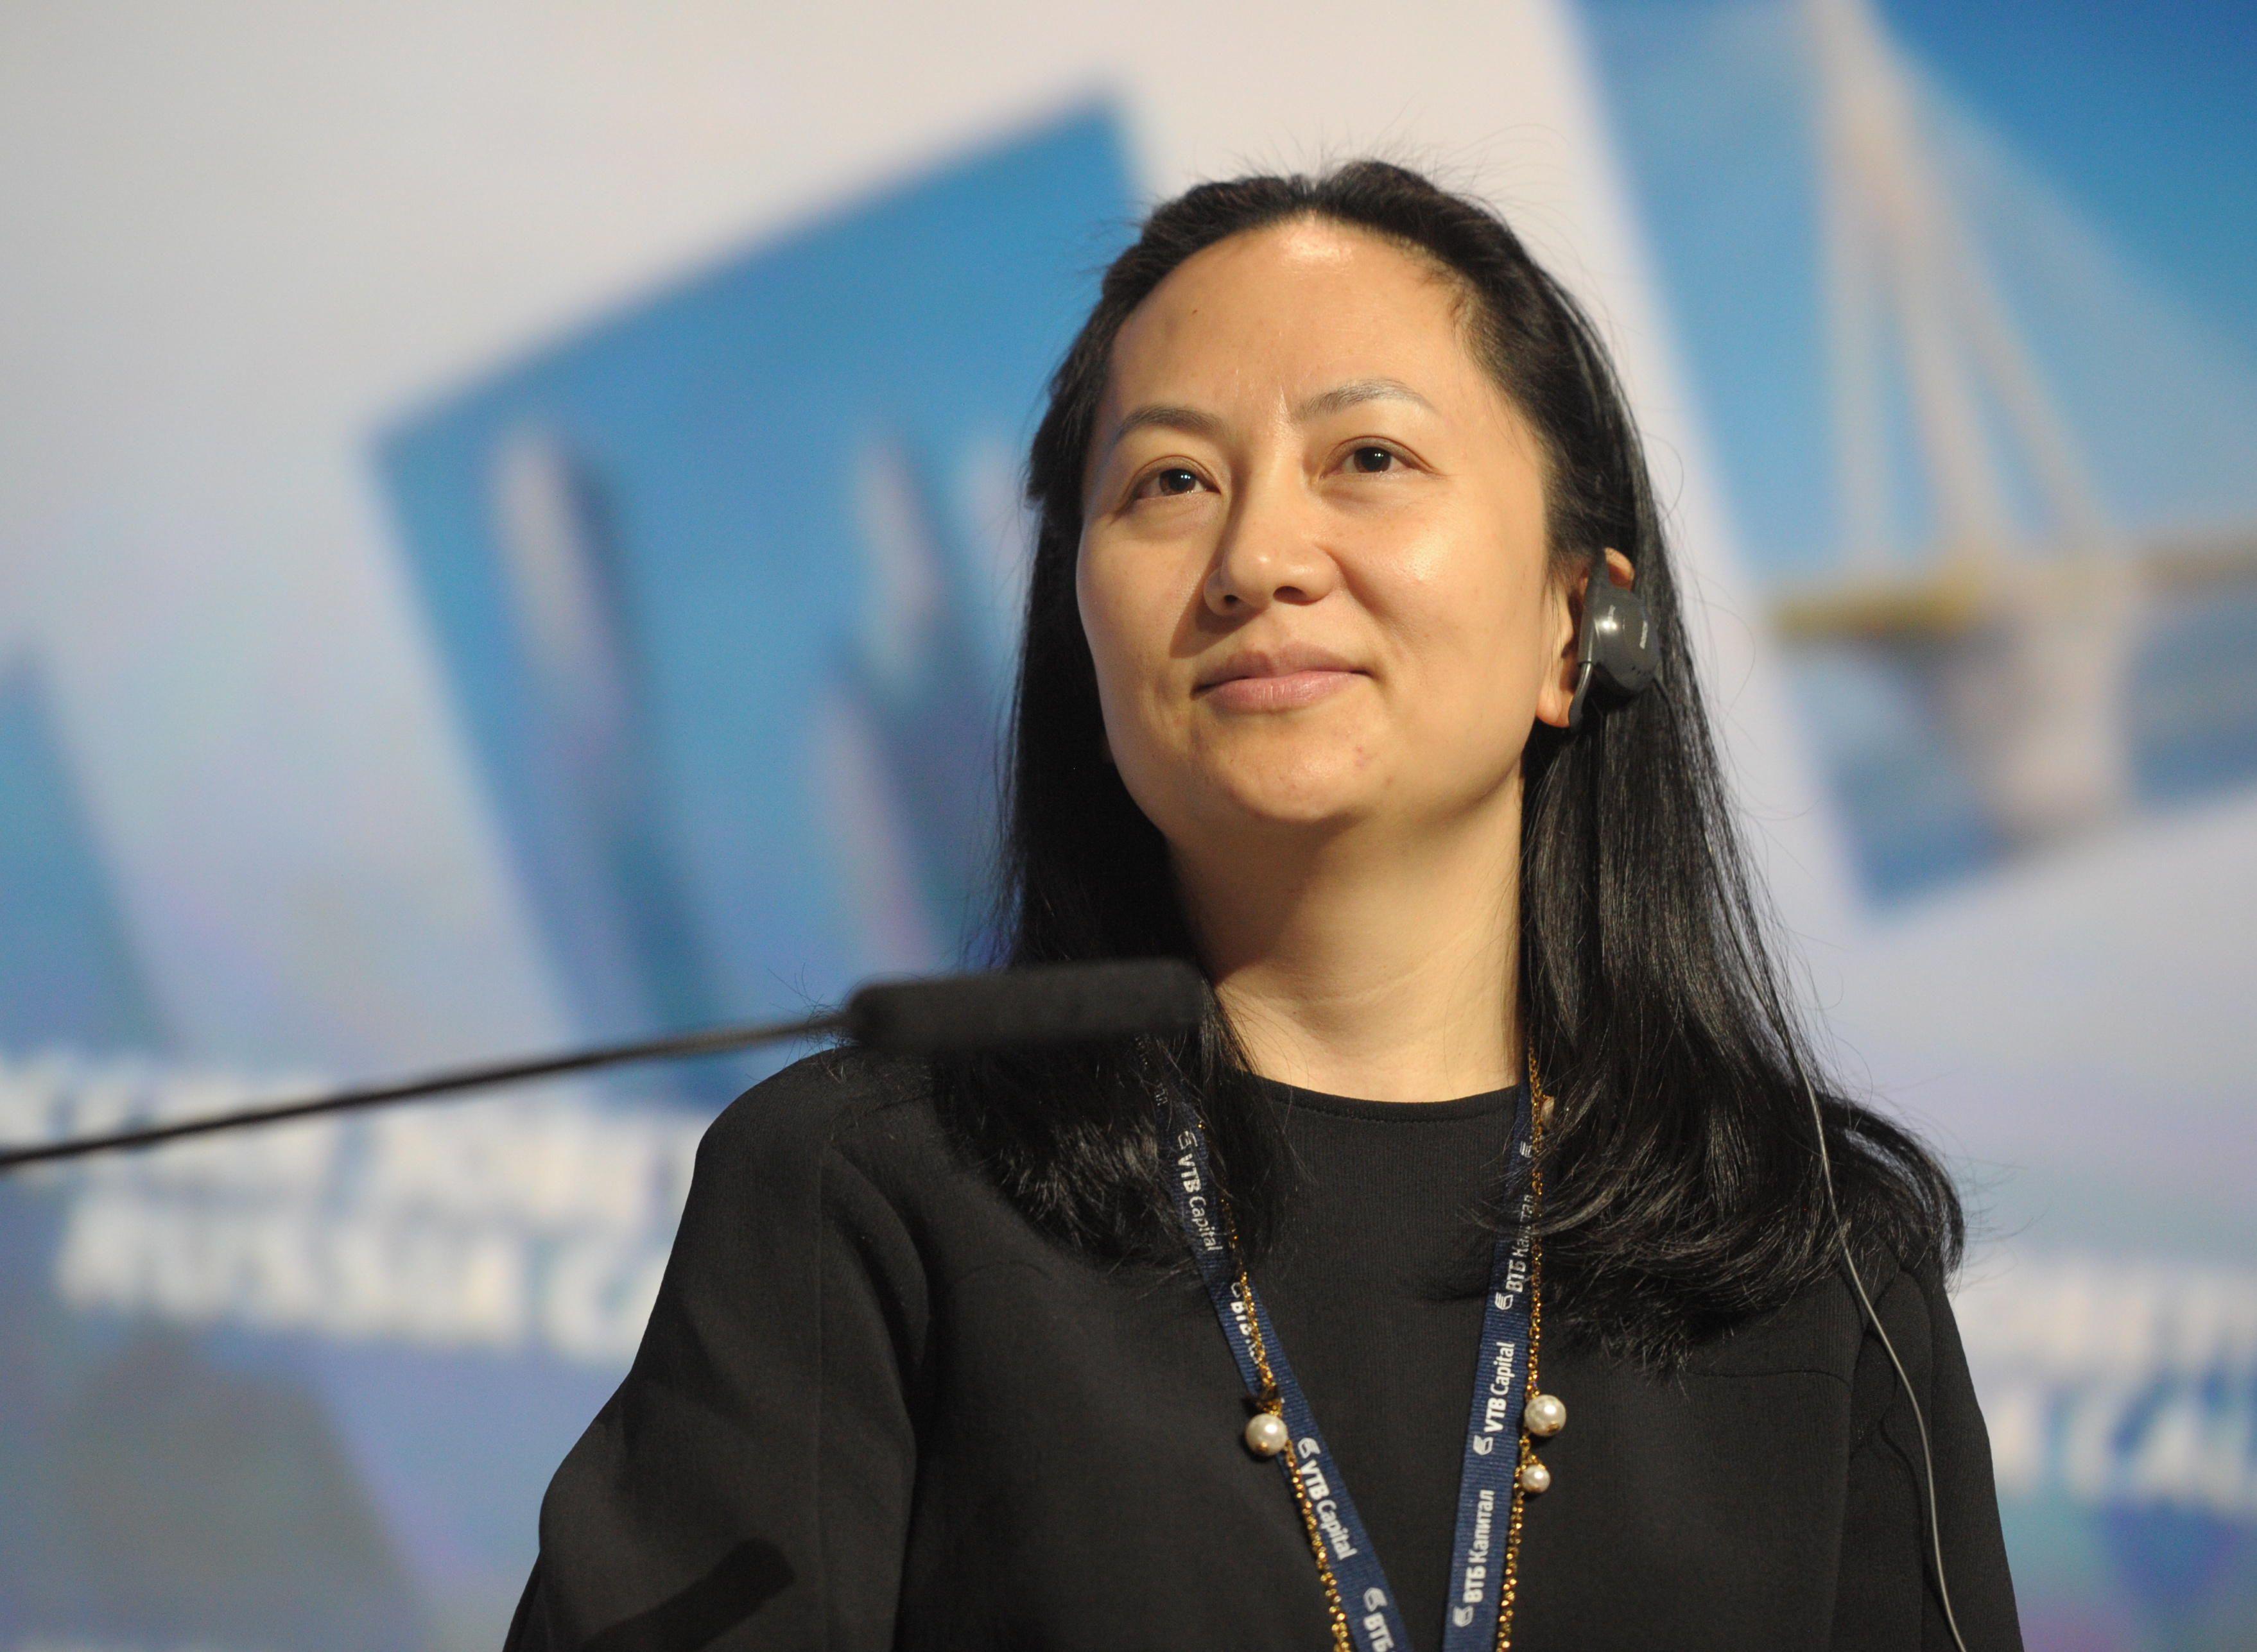 Mengapa pendiri Huawei, Ren Zhengfei, masuk ke panggung utama dalam pertempuran 5G